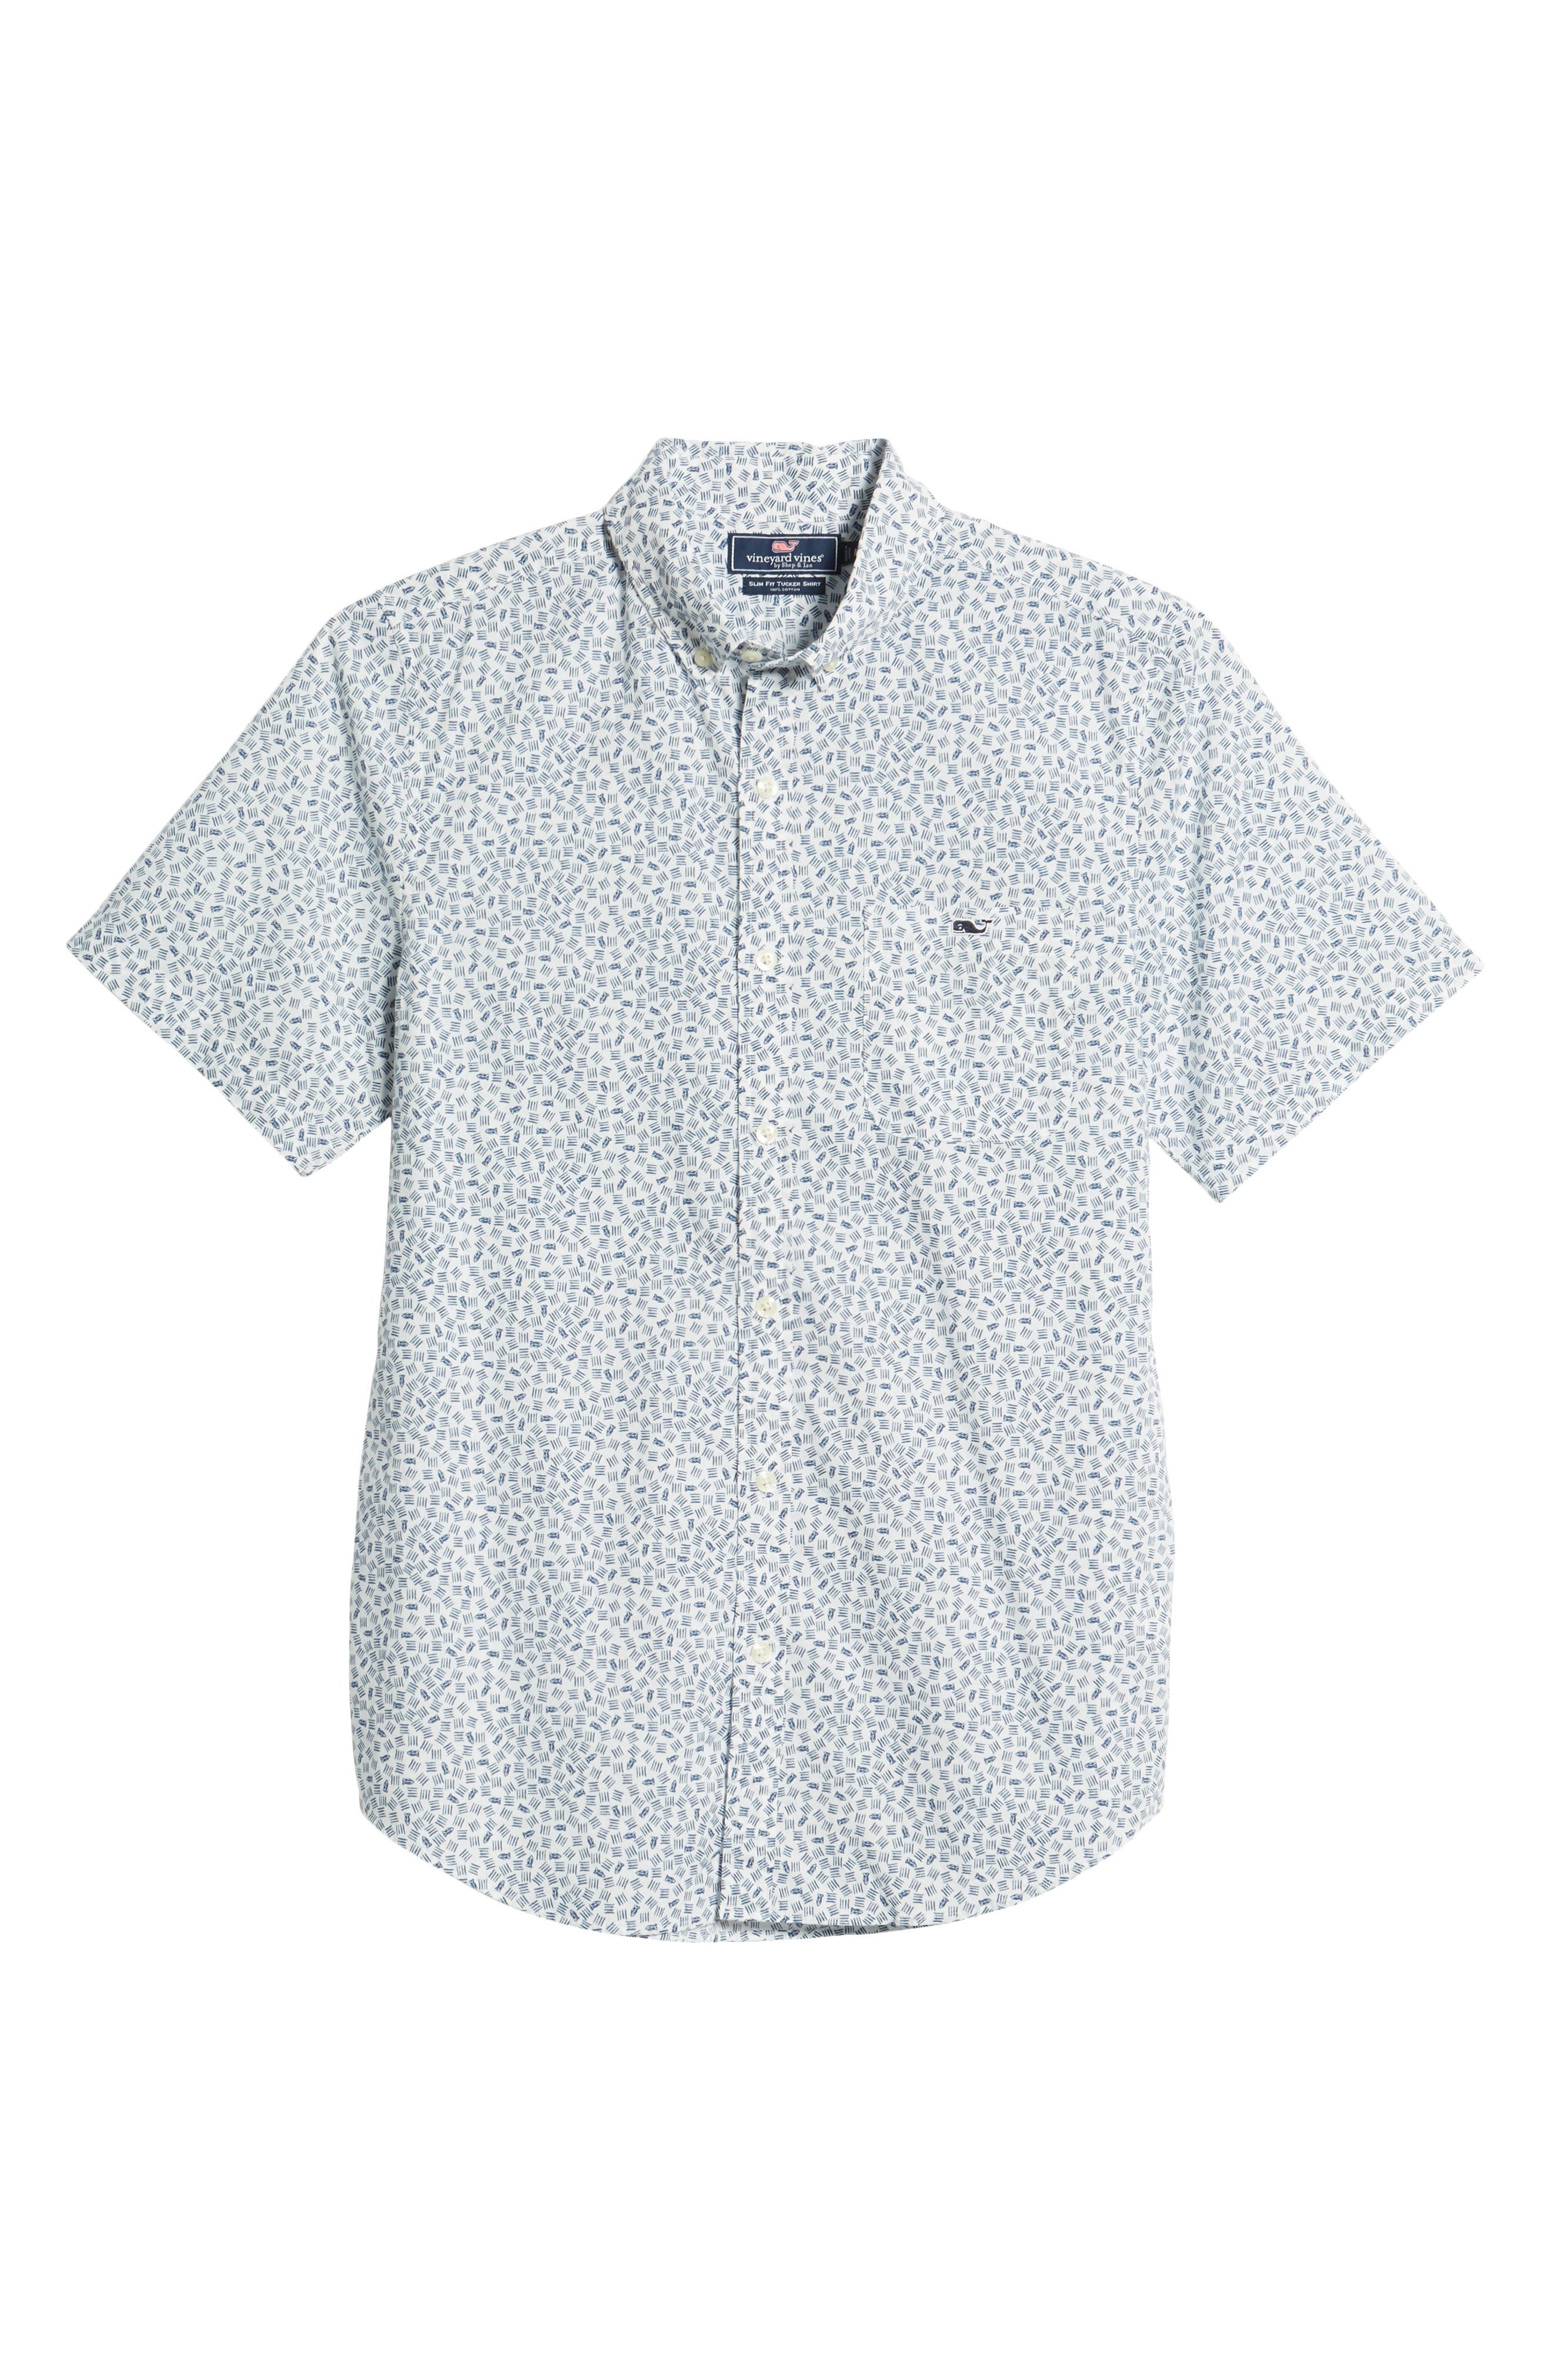 Fish Dash Tucker Slim Fit Sport Shirt,                             Alternate thumbnail 6, color,                             100